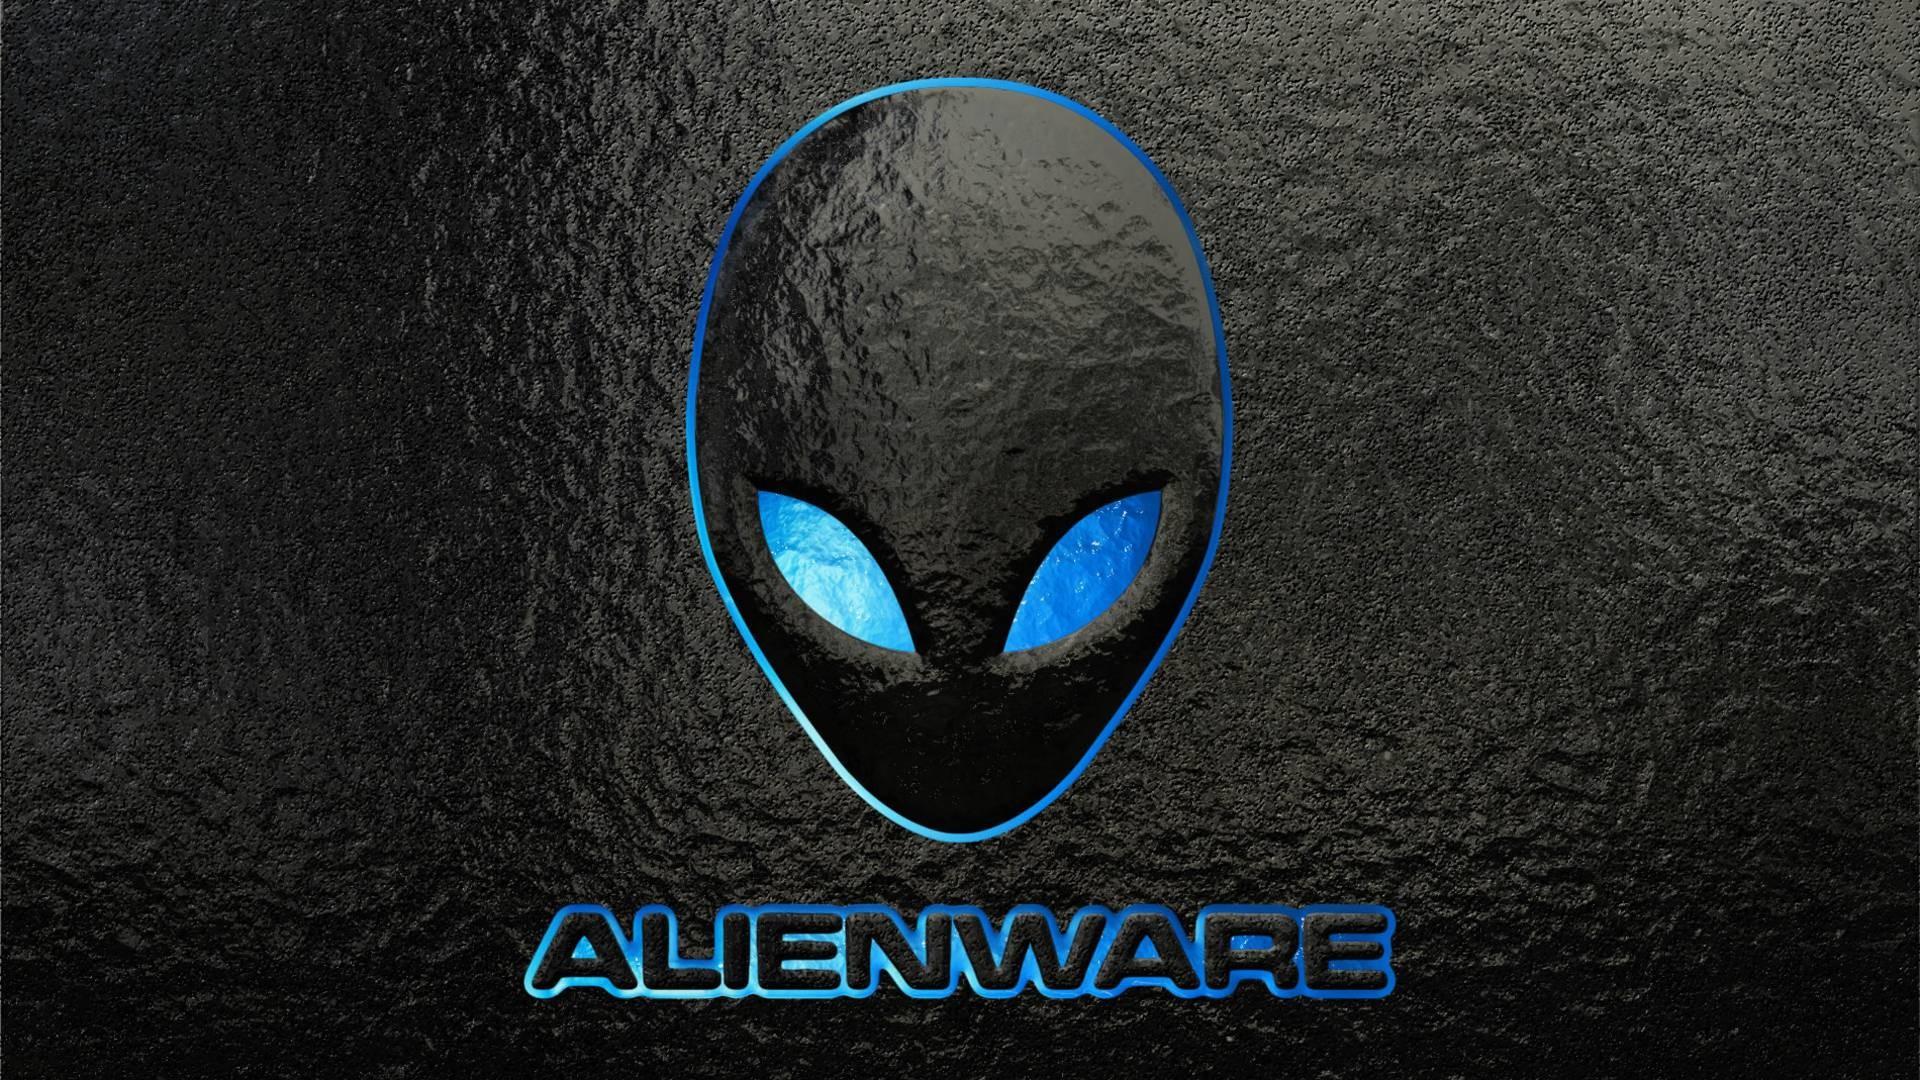 Alienware wallpapers for windows 7 wallpapersafari - 1920x1200 Dell Windows 7 Desktop Wallpaper Wallpapersafari